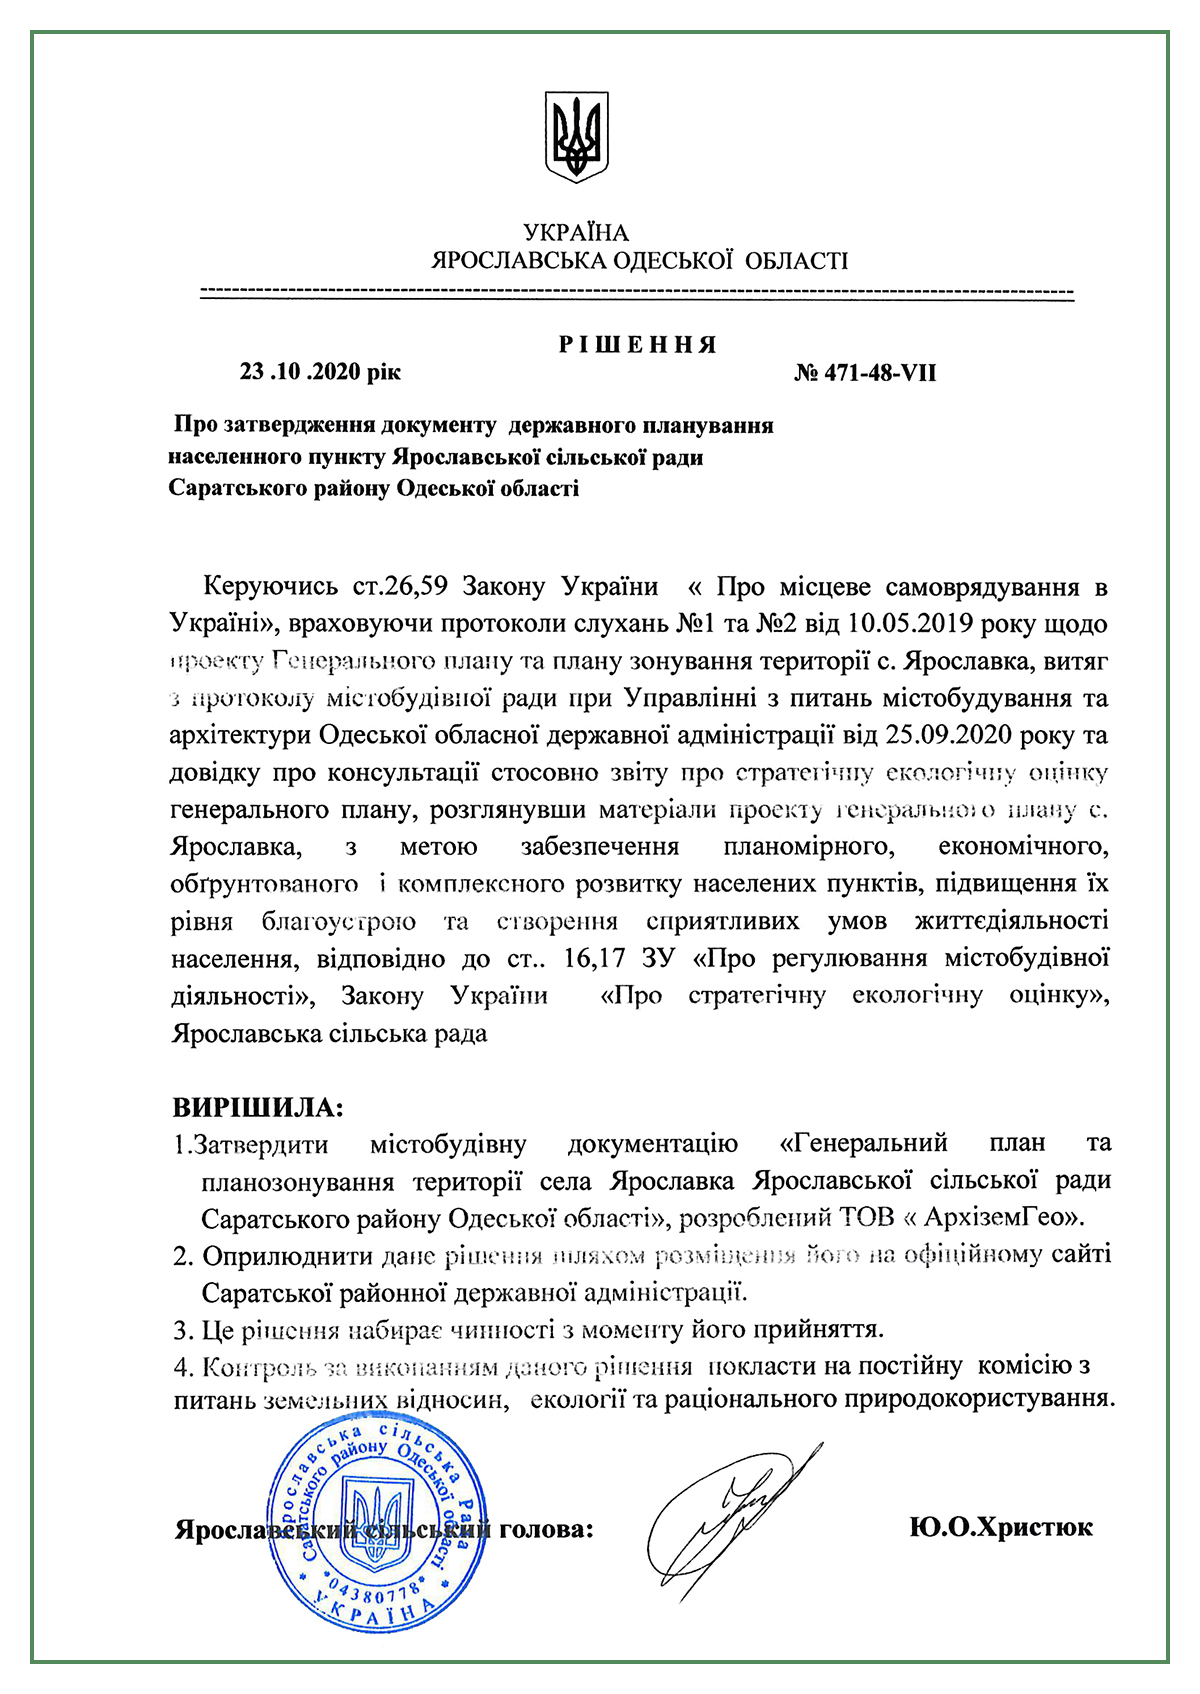 утвердили генплан села Ярославка